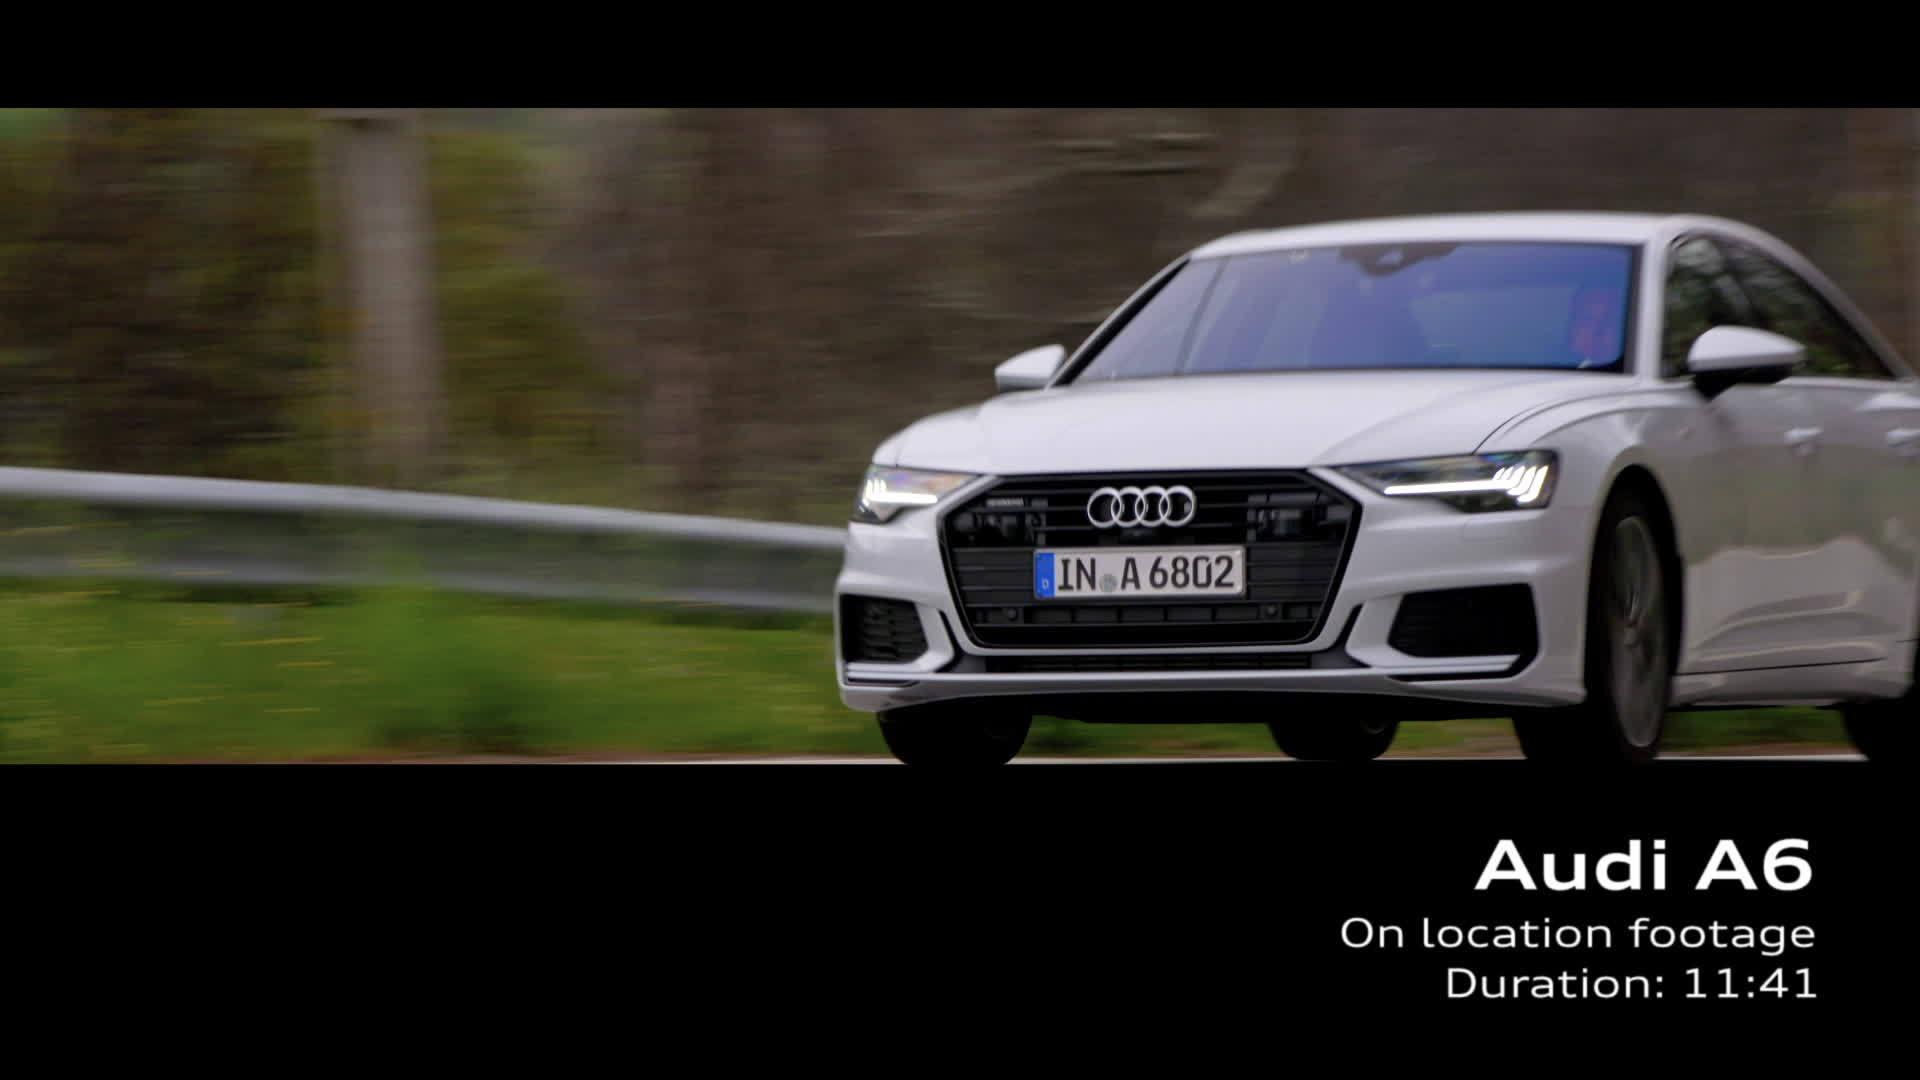 Audi A6 Footage Suzukagrau